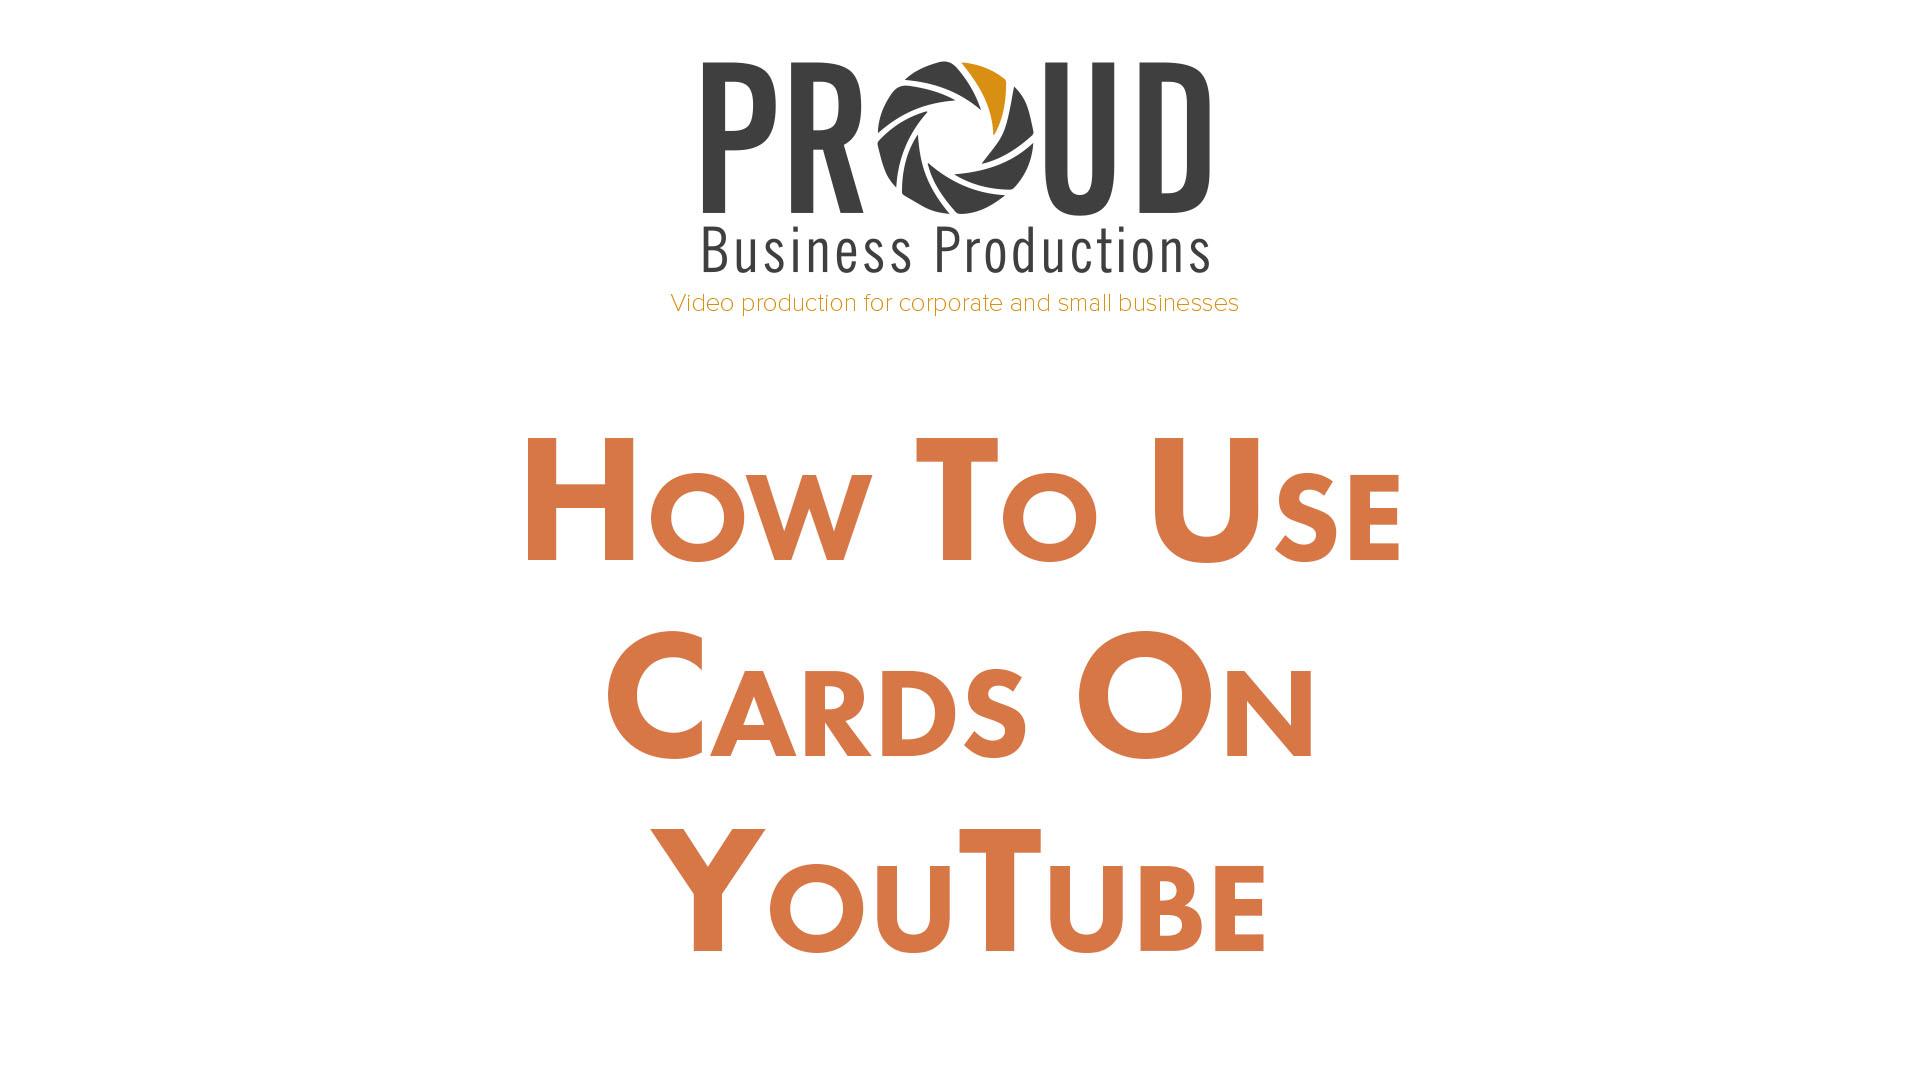 Cards Thumb.jpg